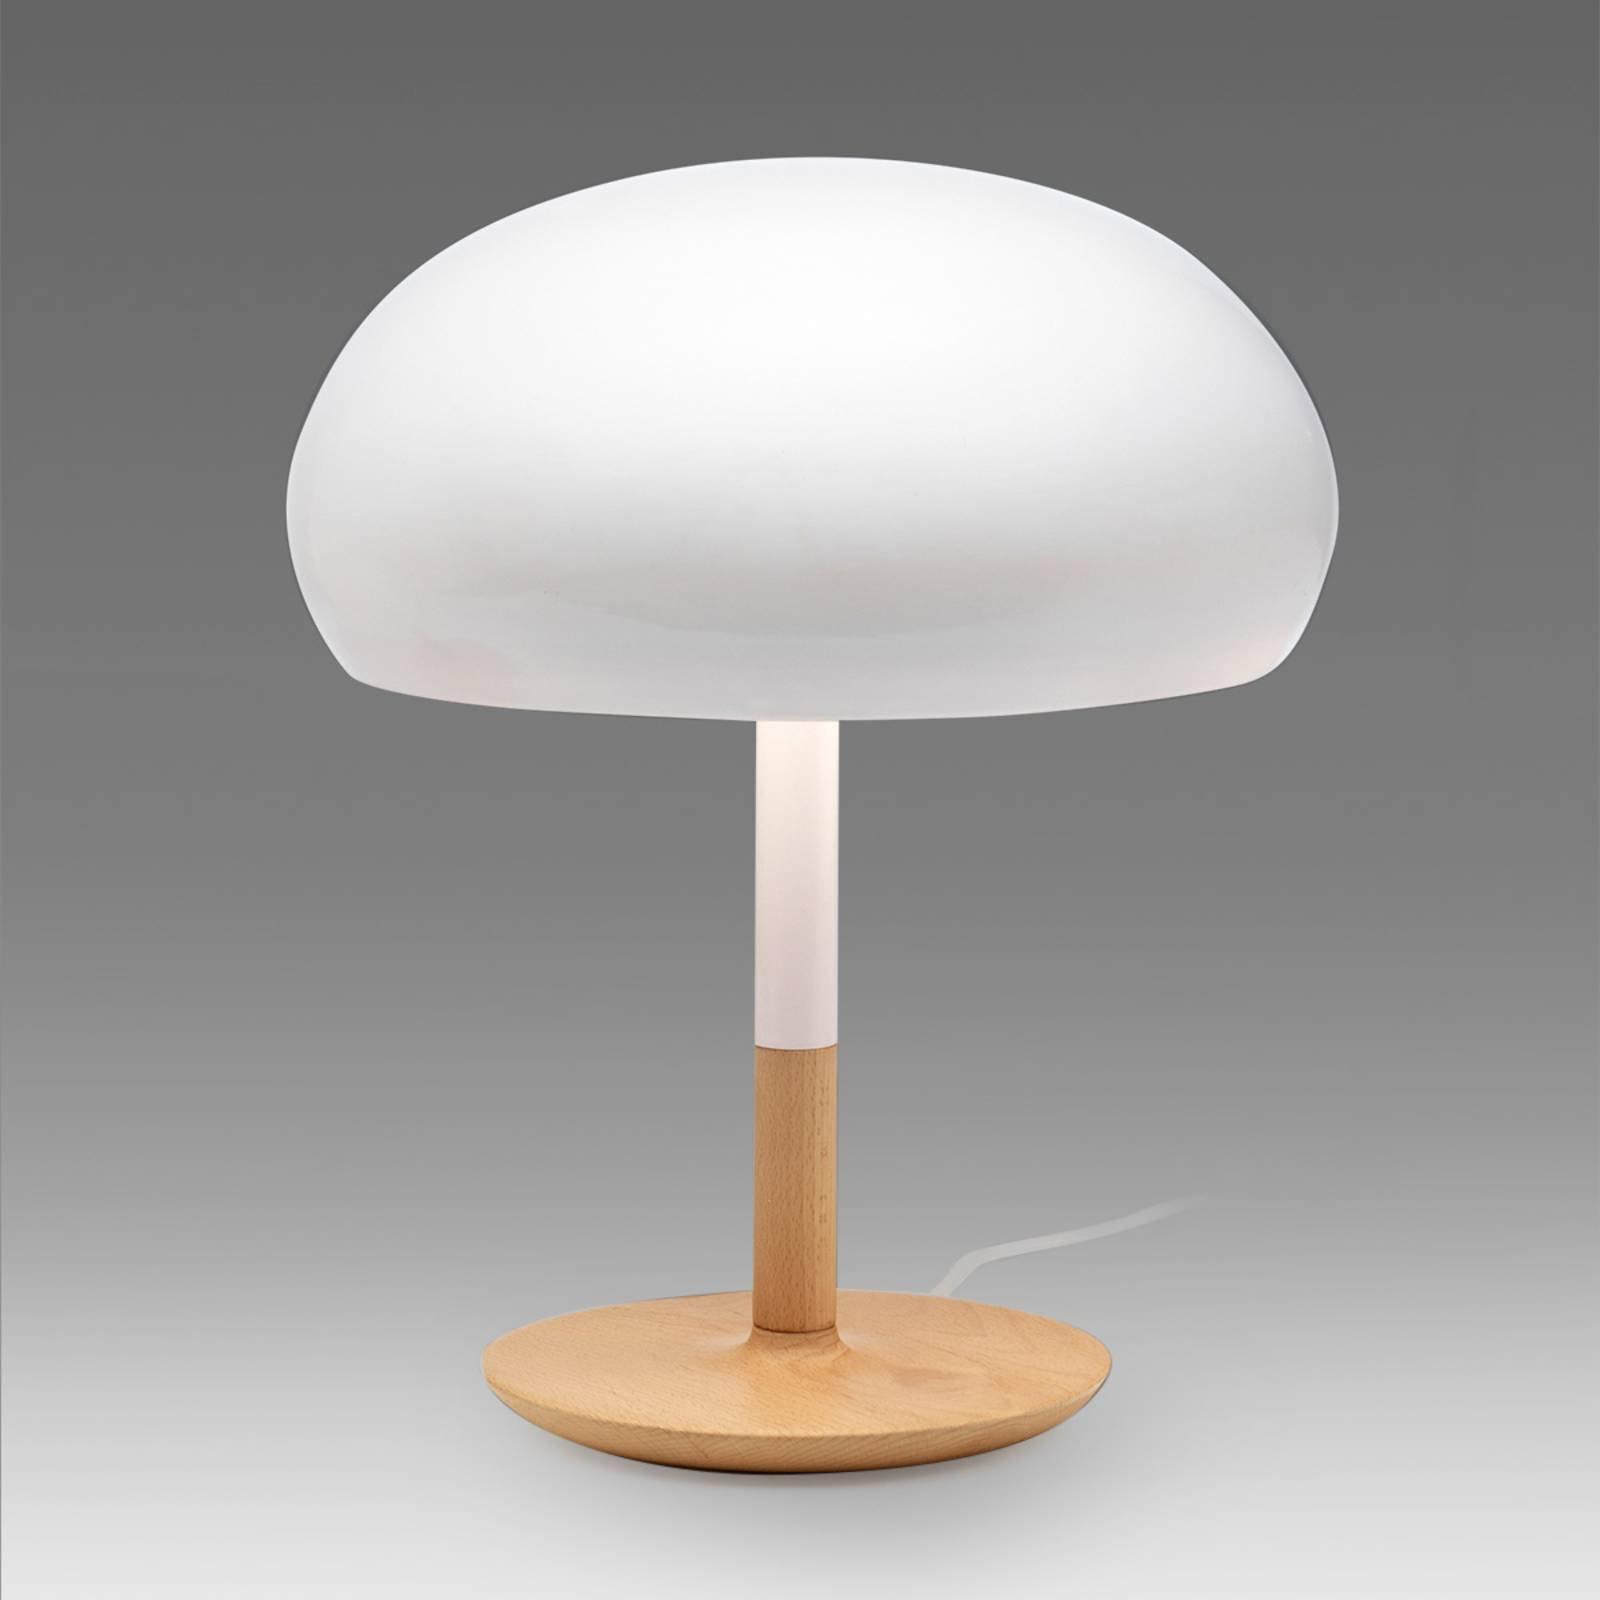 Keramisk bordlampe Aspen i soppform, 45 cm